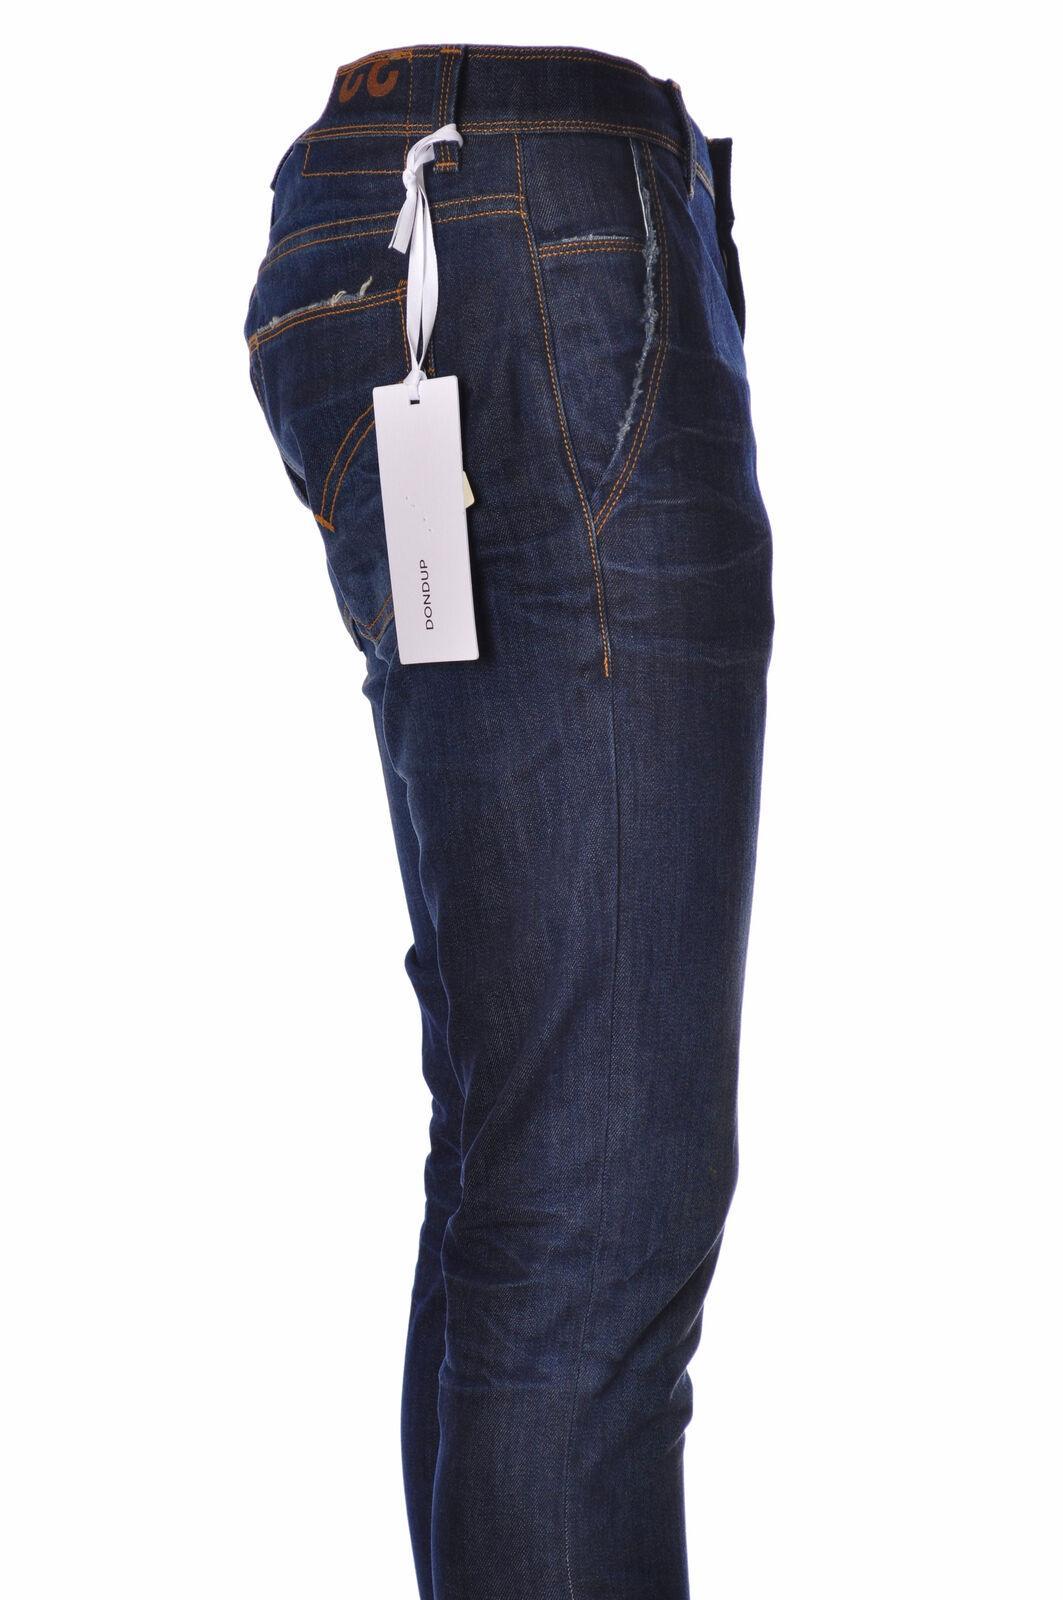 Dondup - Jeans-Pants-slim fit - Man - Denim - 2481531A191414